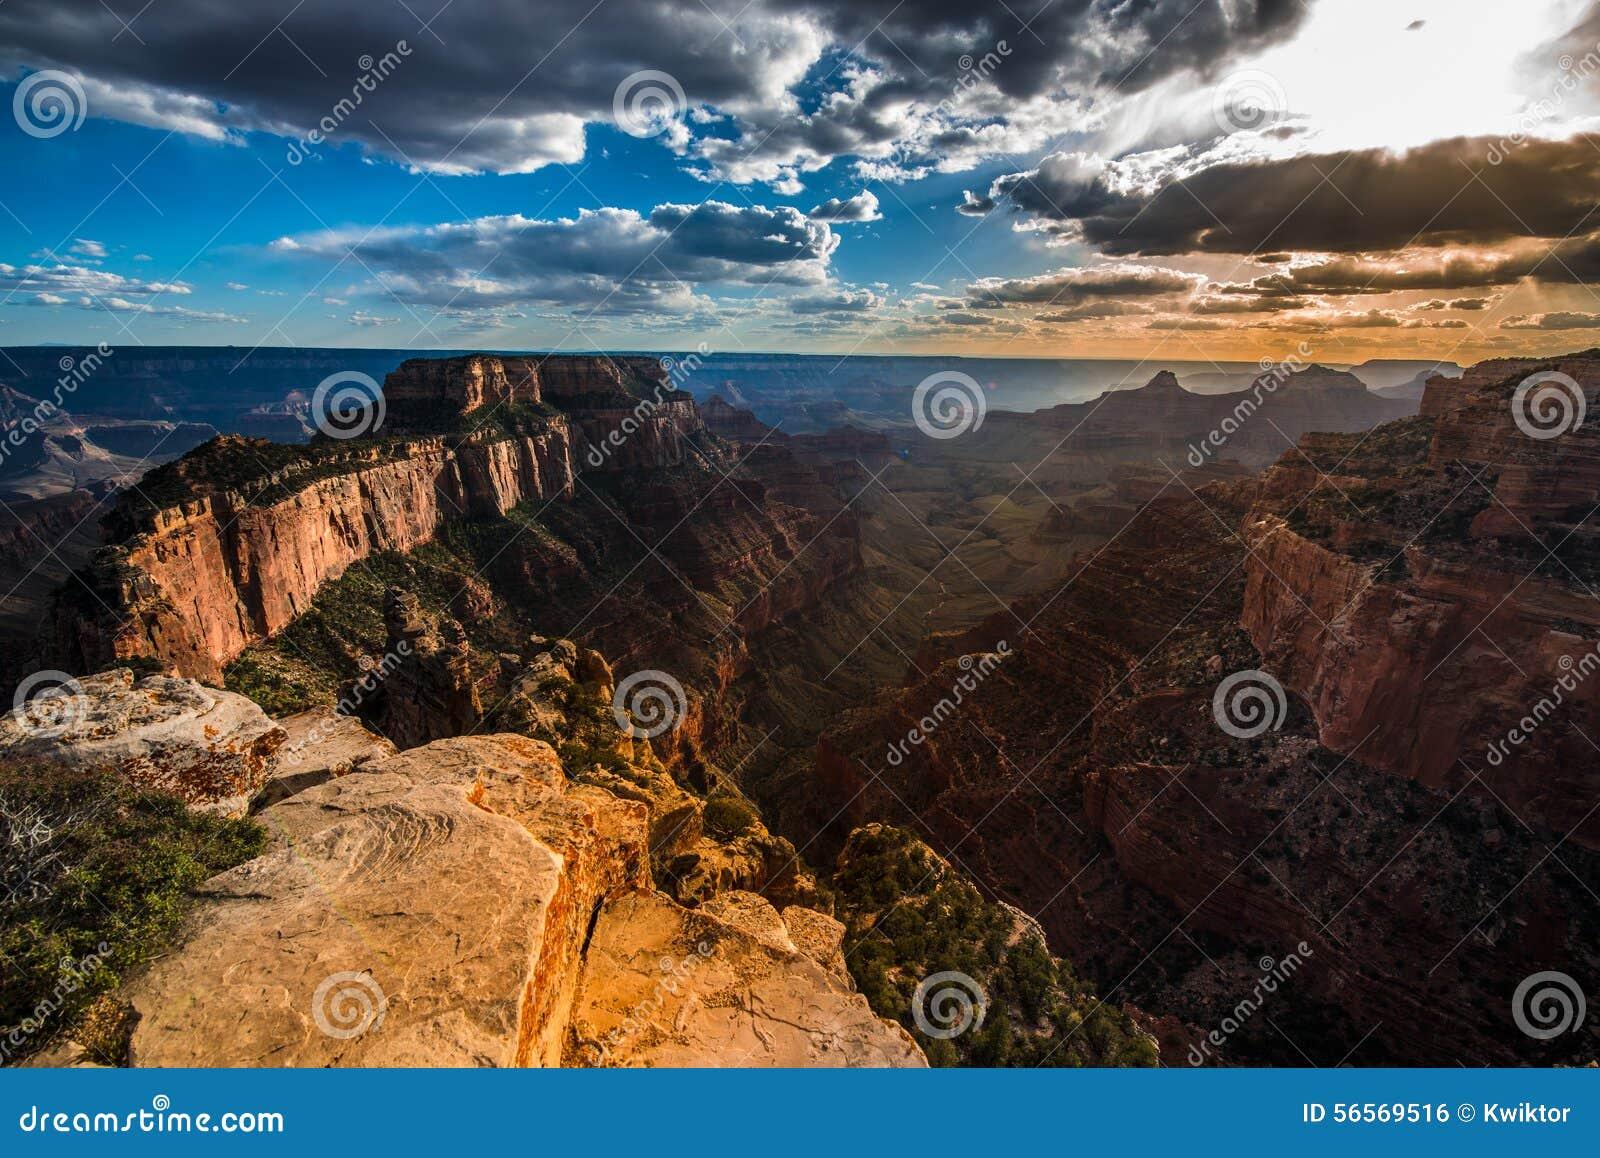 Download Το μεγάλο ακρωτήριο βόρειων πλαισίων φαραγγιών βασιλικό αγνοεί στο ηλιοβασίλεμα Wotans Thro Στοκ Εικόνες - εικόνα από βουνό, φαράγγι: 56569516